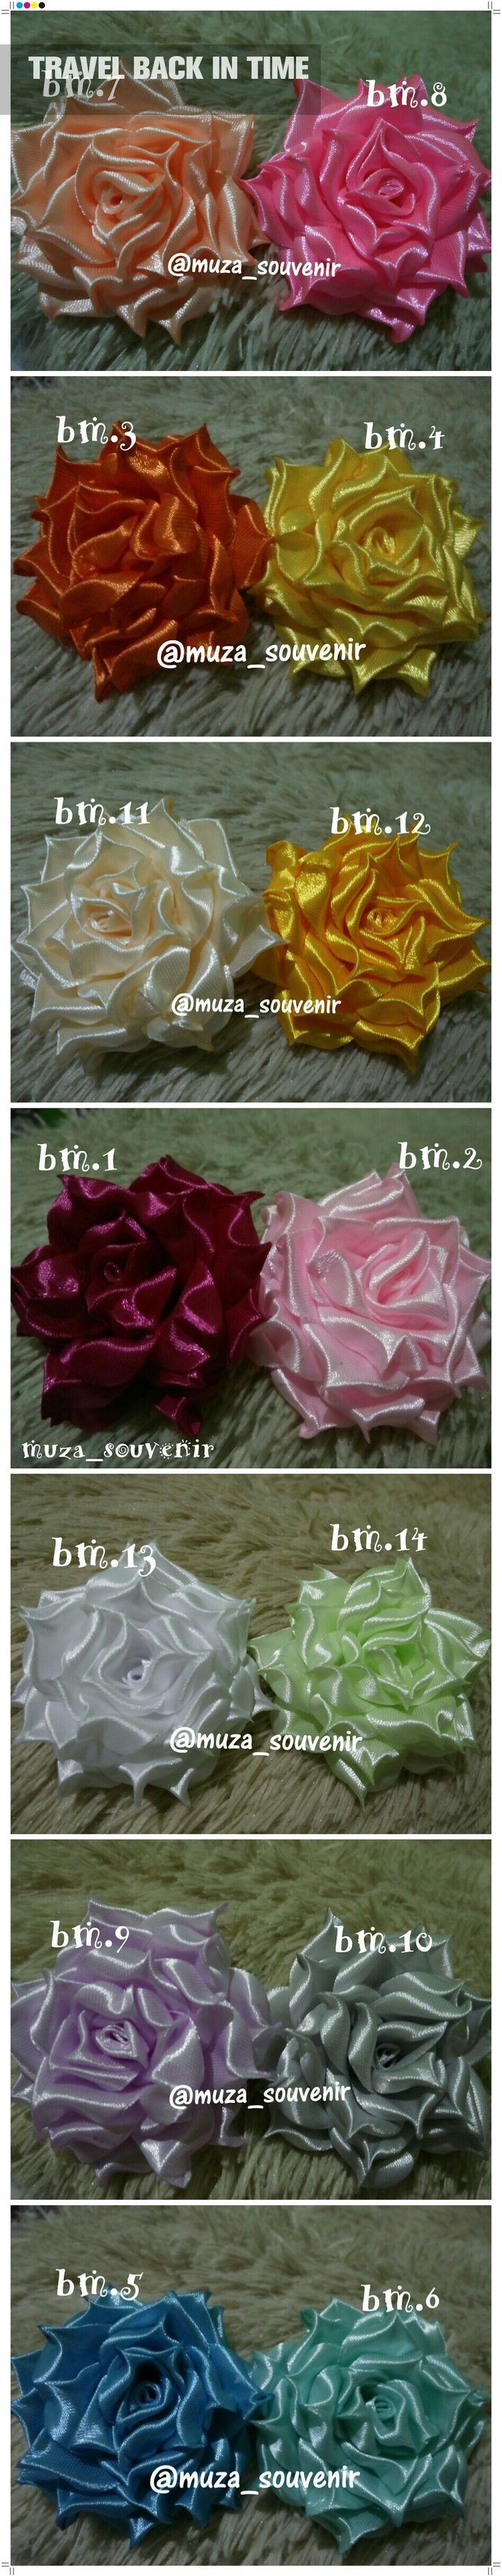 bross bunga mawar cantik hanya Rp. 6000